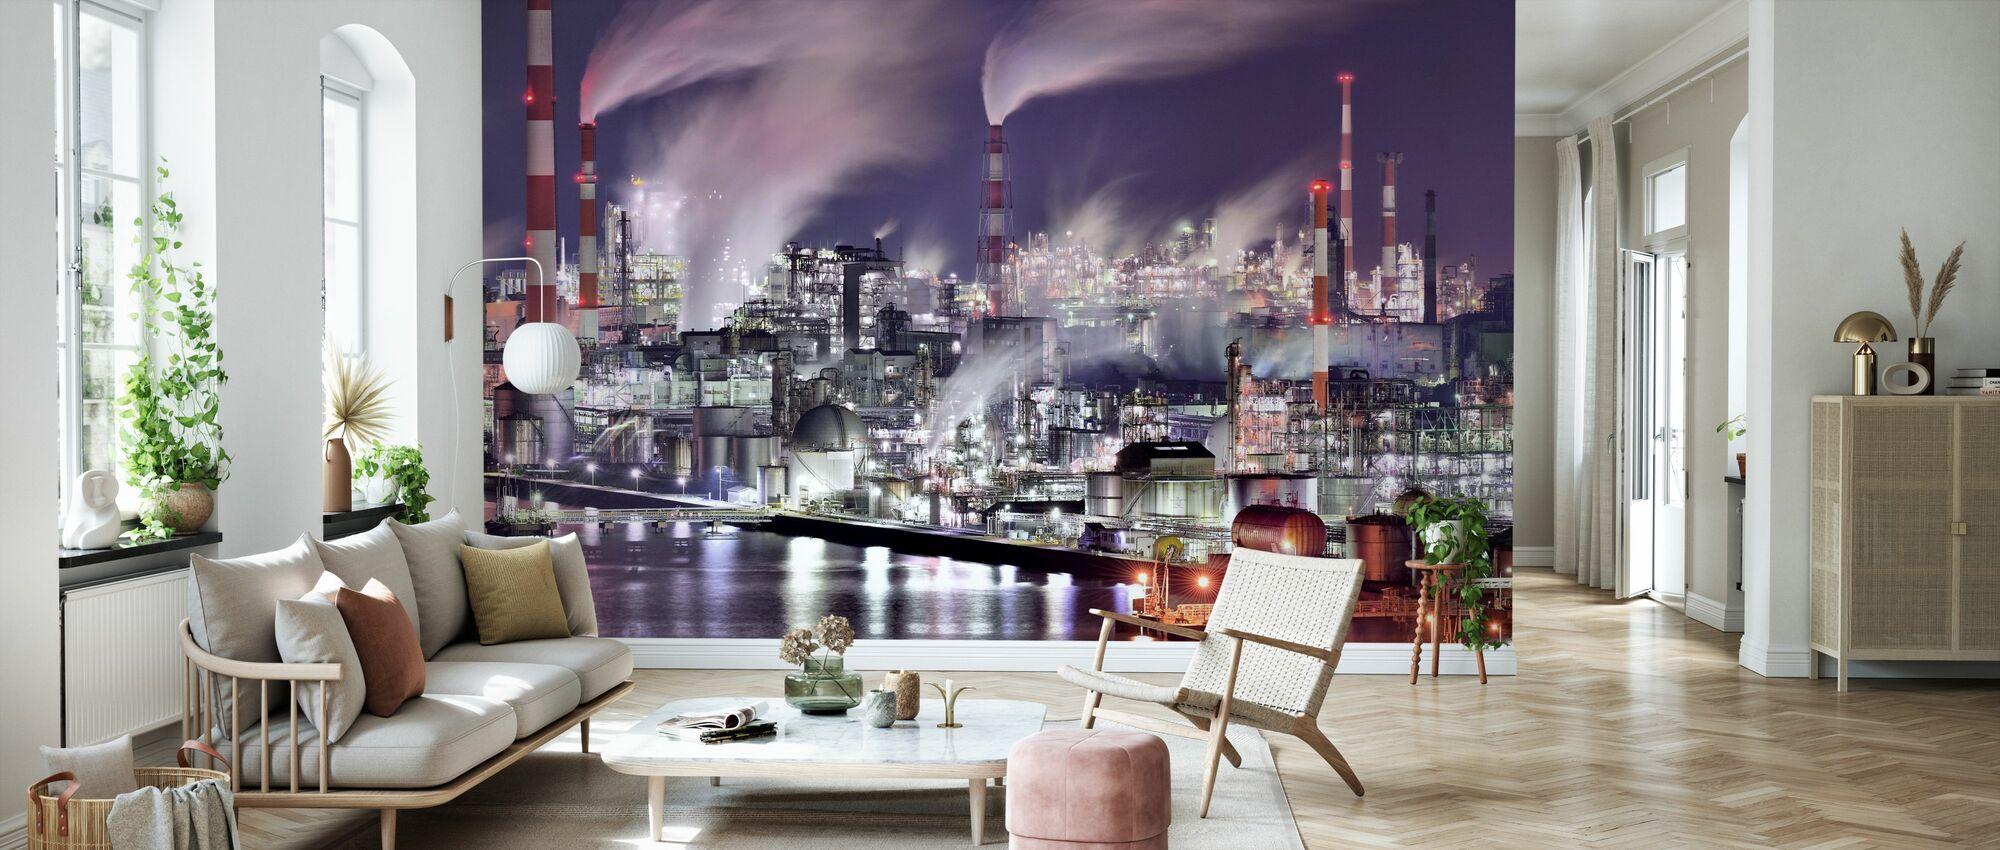 It's a Steam World - Wallpaper - Living Room